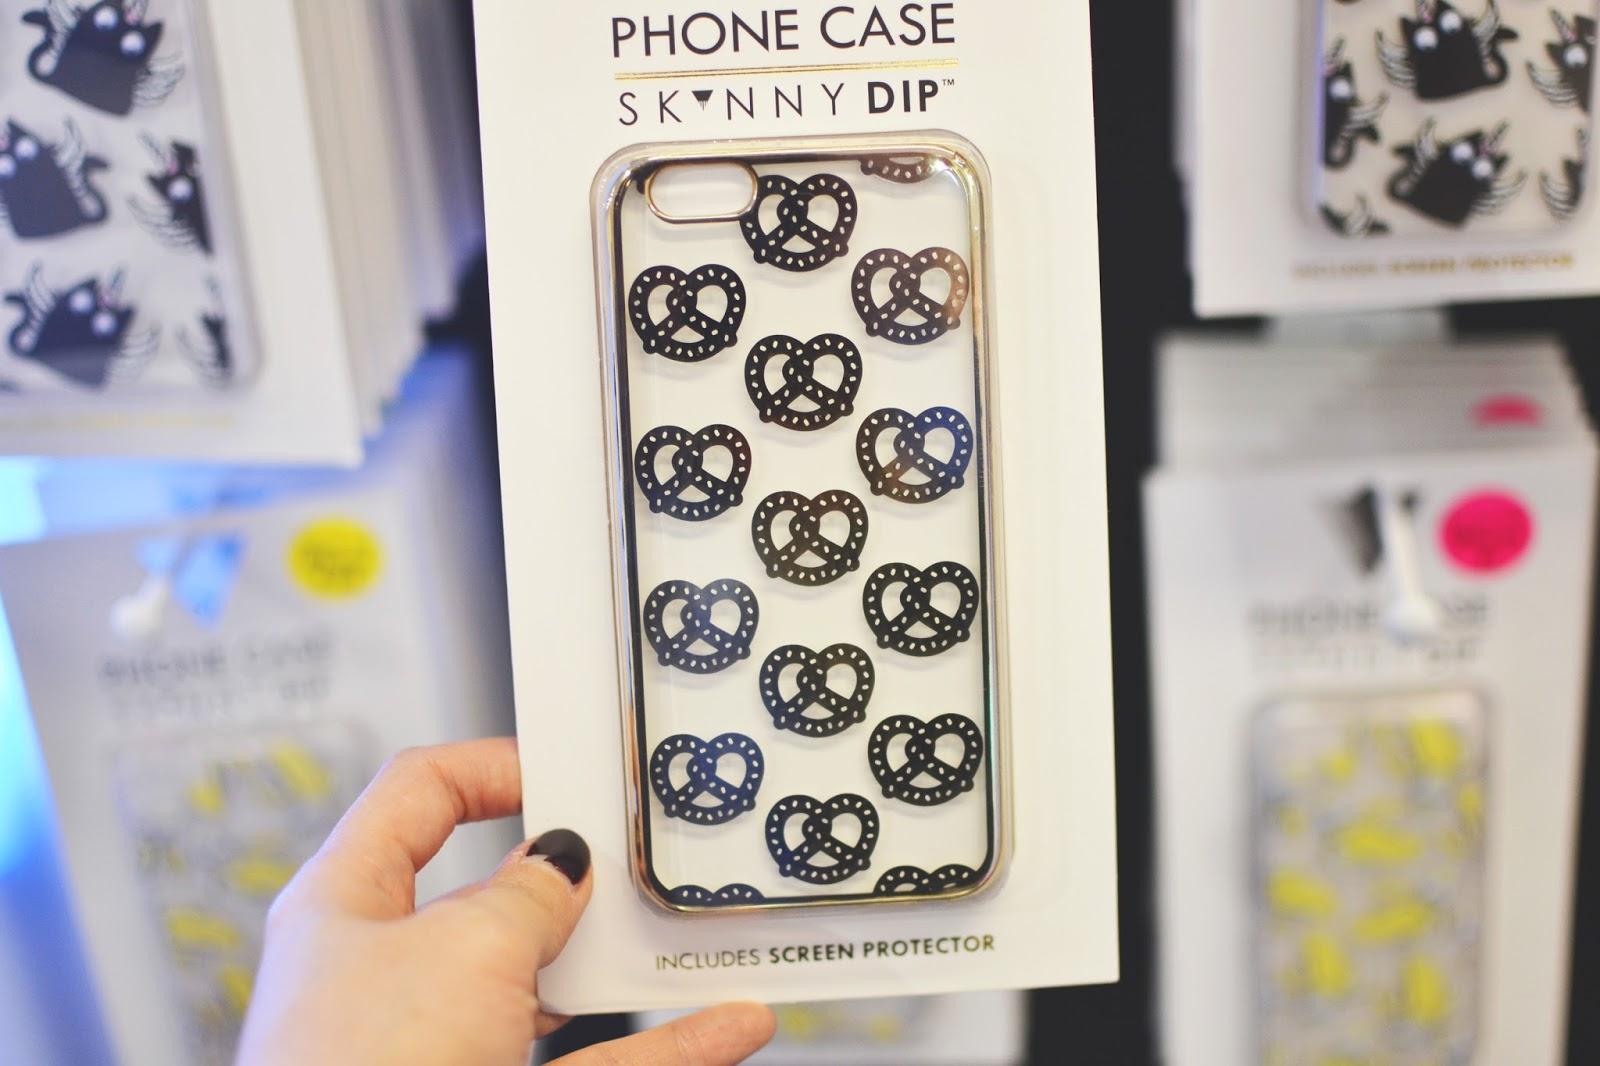 skinnydip phone cover, pretzel print